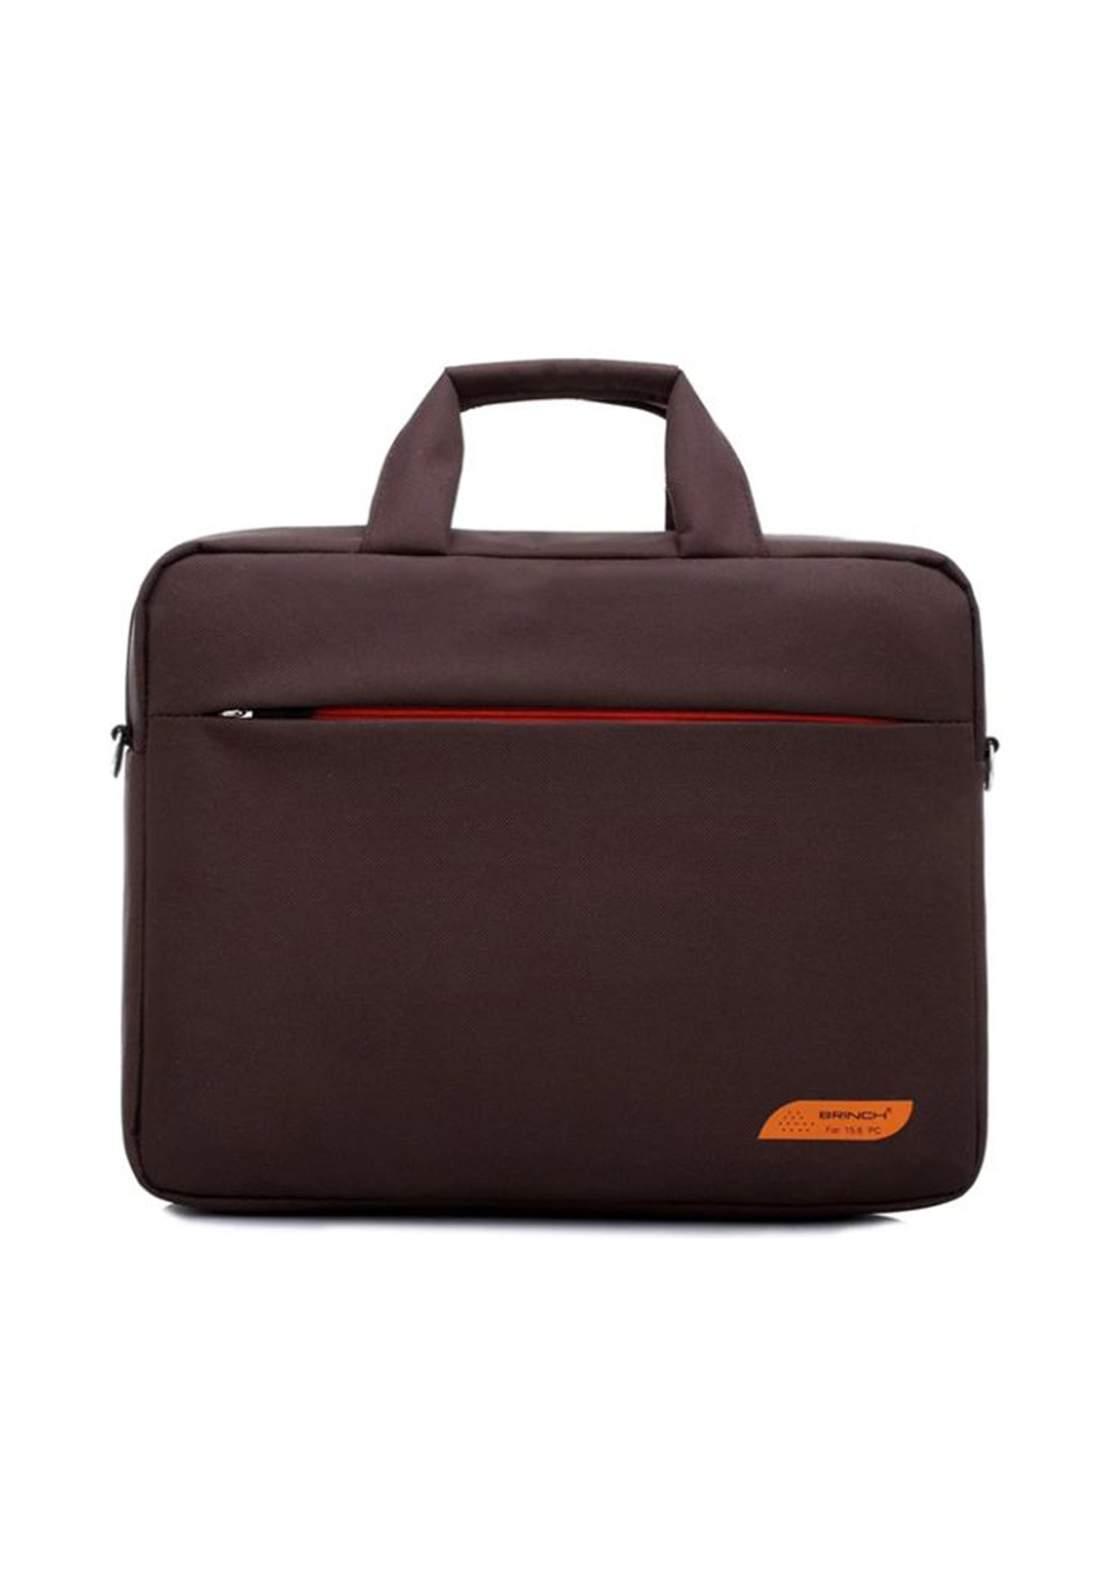 "SS-206  15.6"" Laptop Bag - Brown  حقيبة لابتوب"